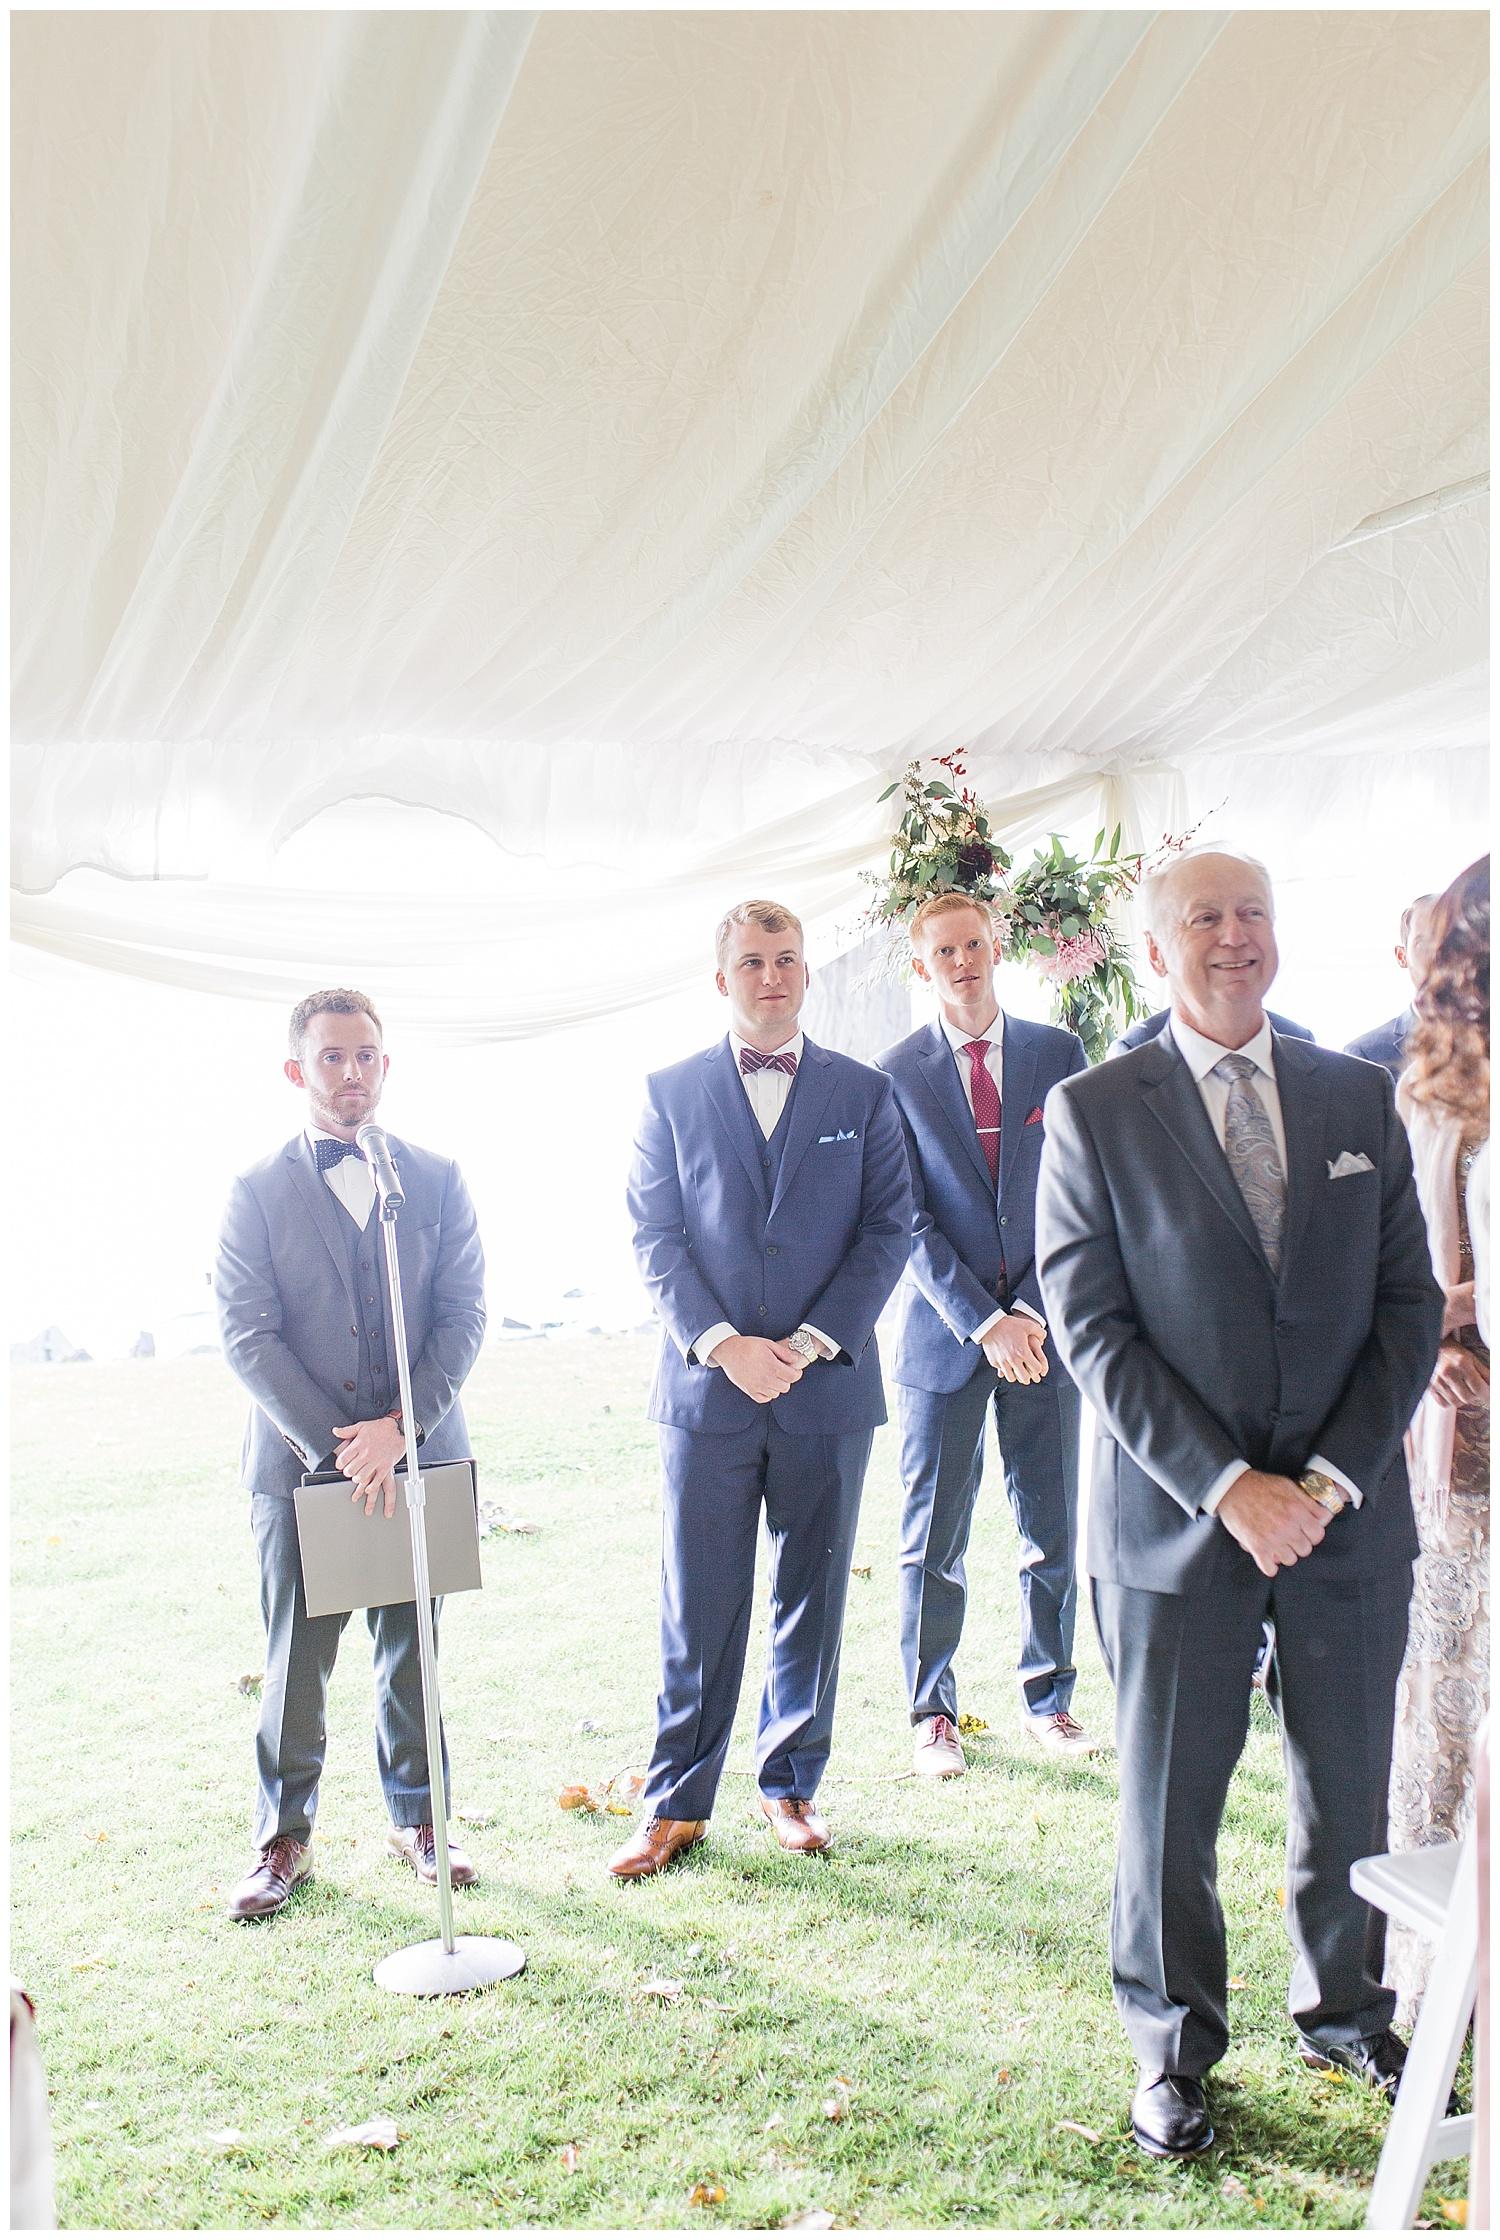 Margaret and Colin - Inns of Aurora - Lass and Beau-1000_Buffalo wedding photography.jpg